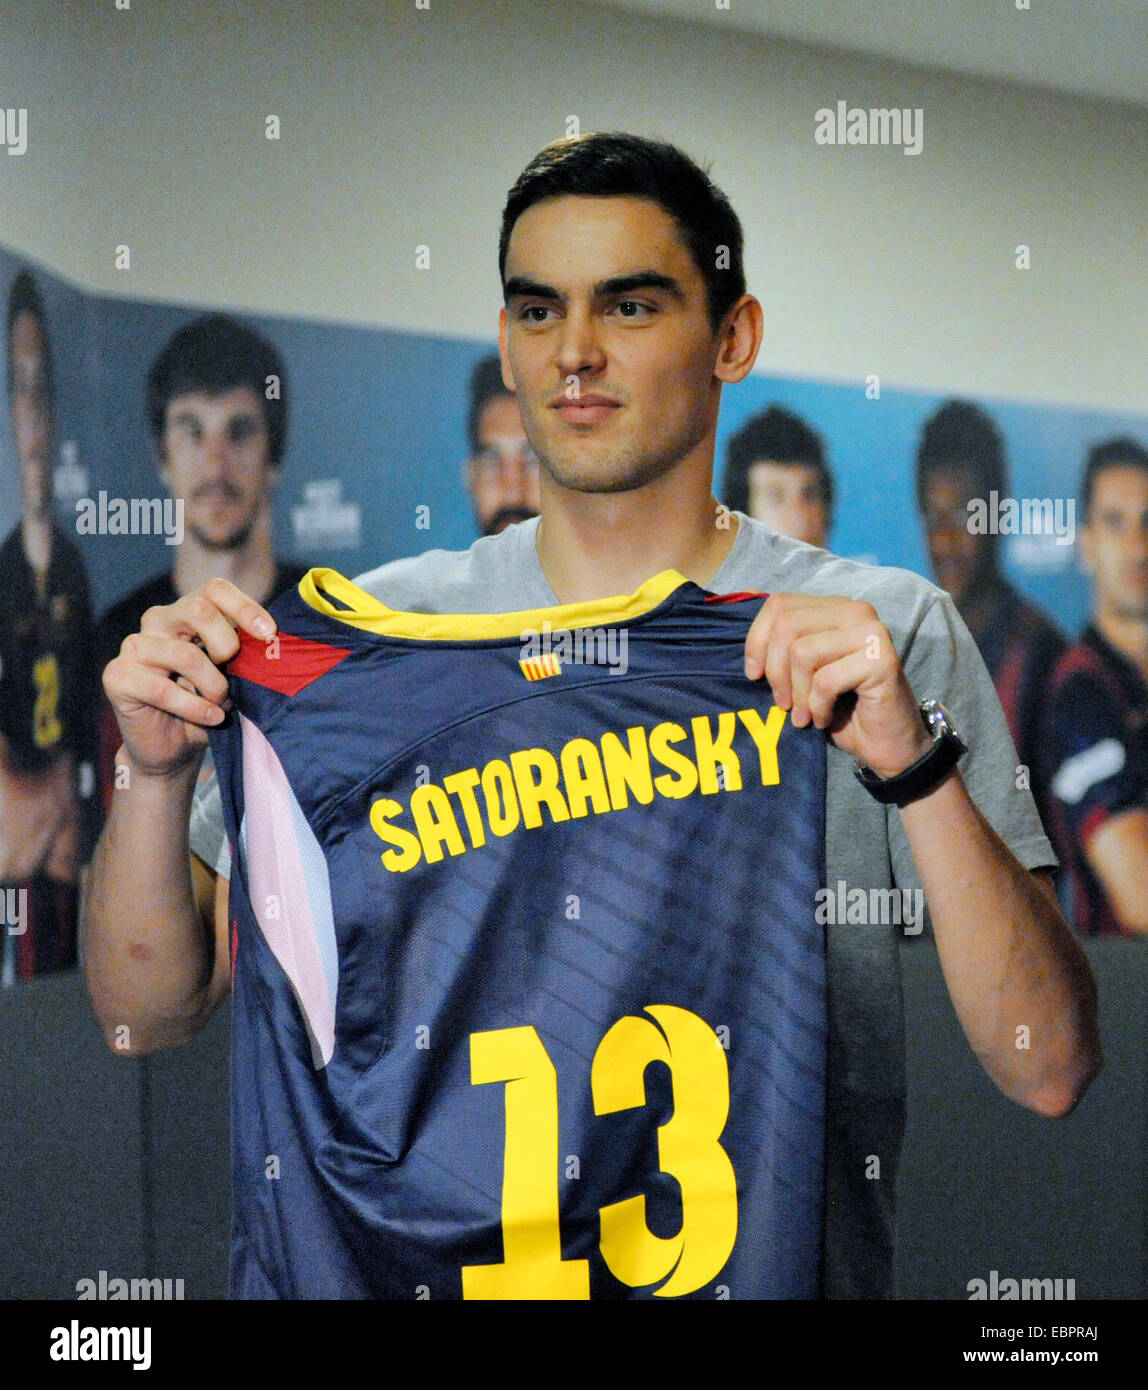 half off 45a1e 5144d Czech Republic's player Tomas Satoransky of FC Barcelona ...